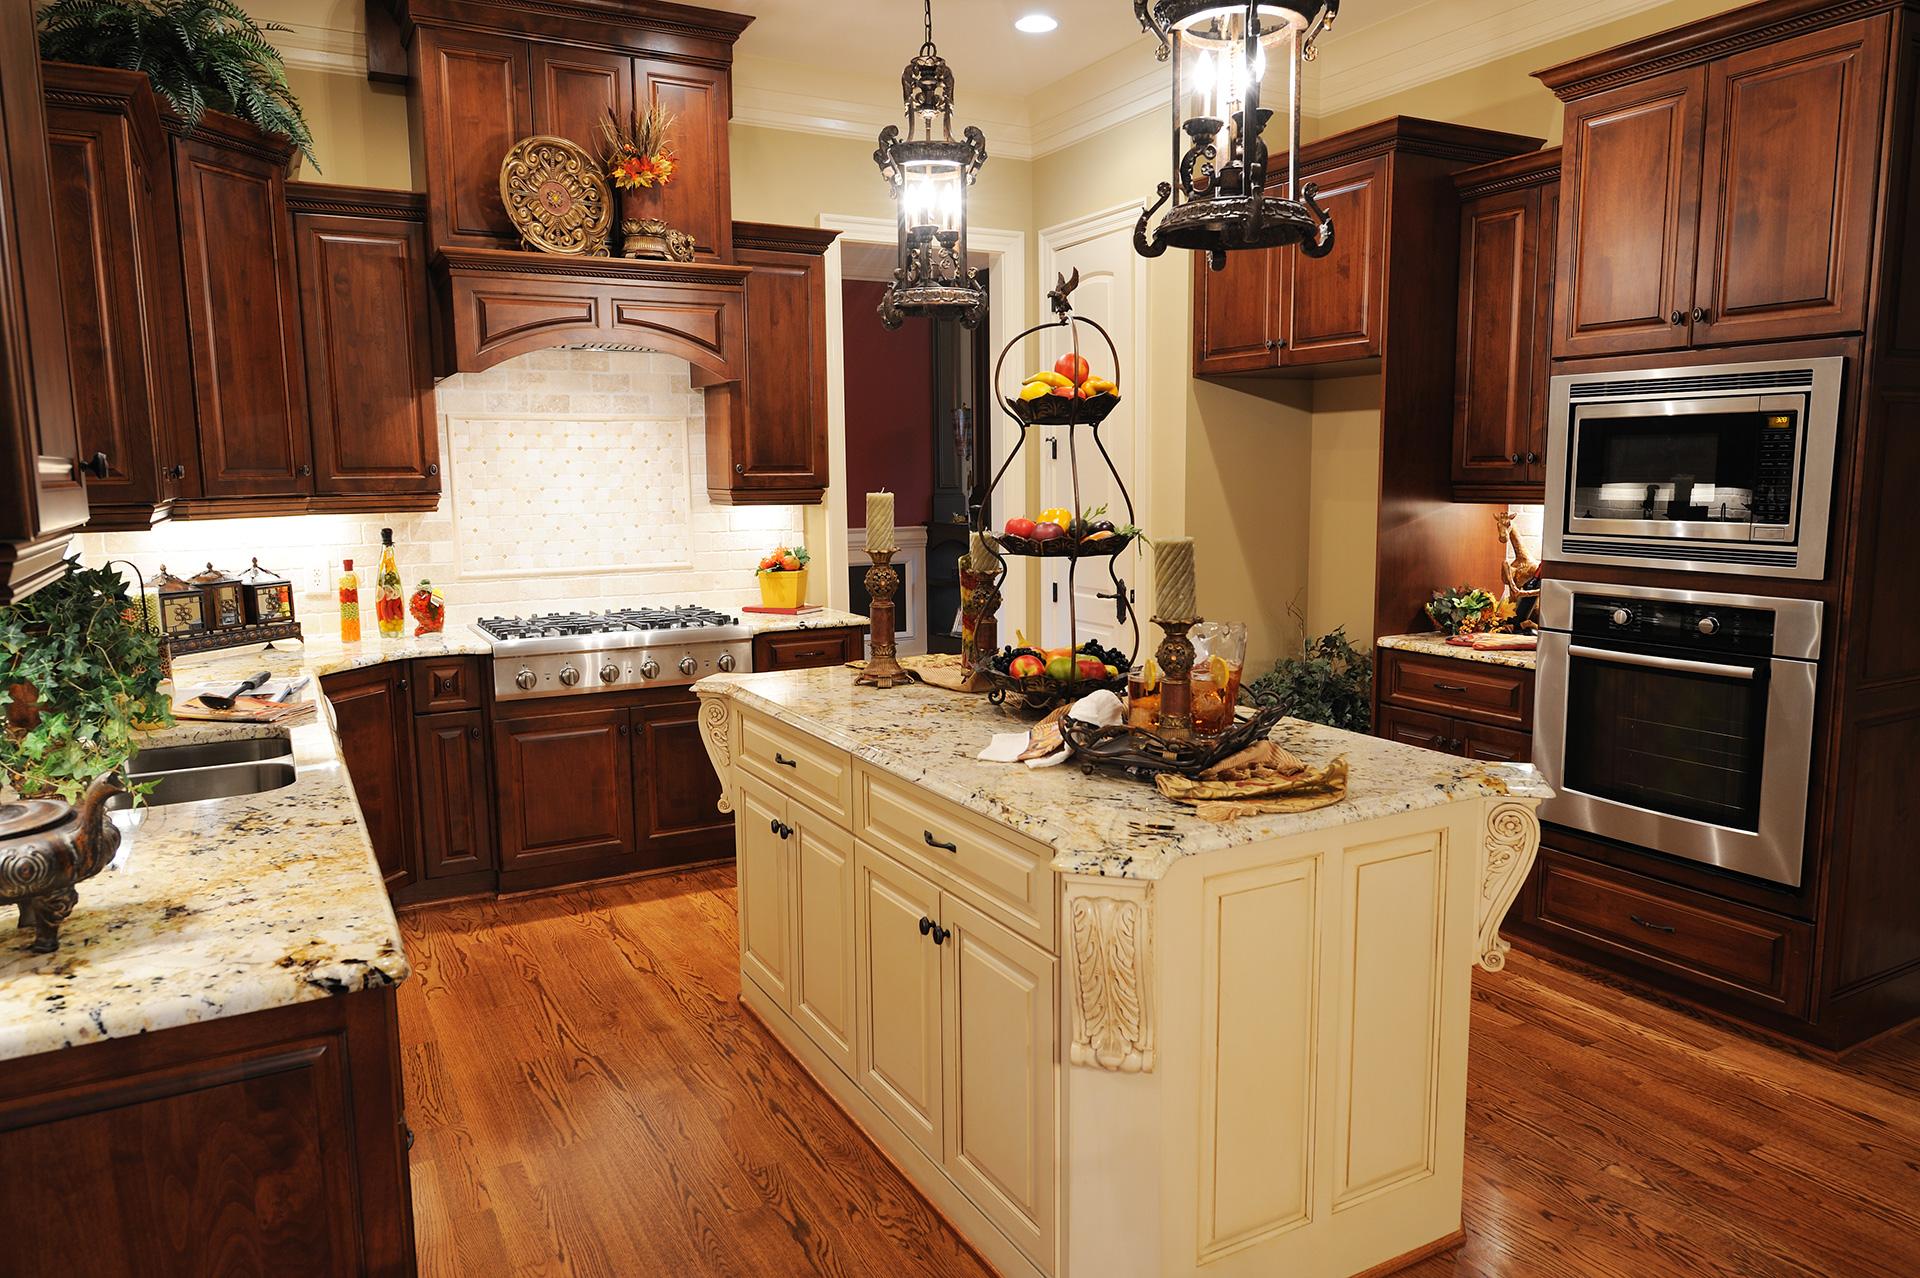 Trending kitchen styles